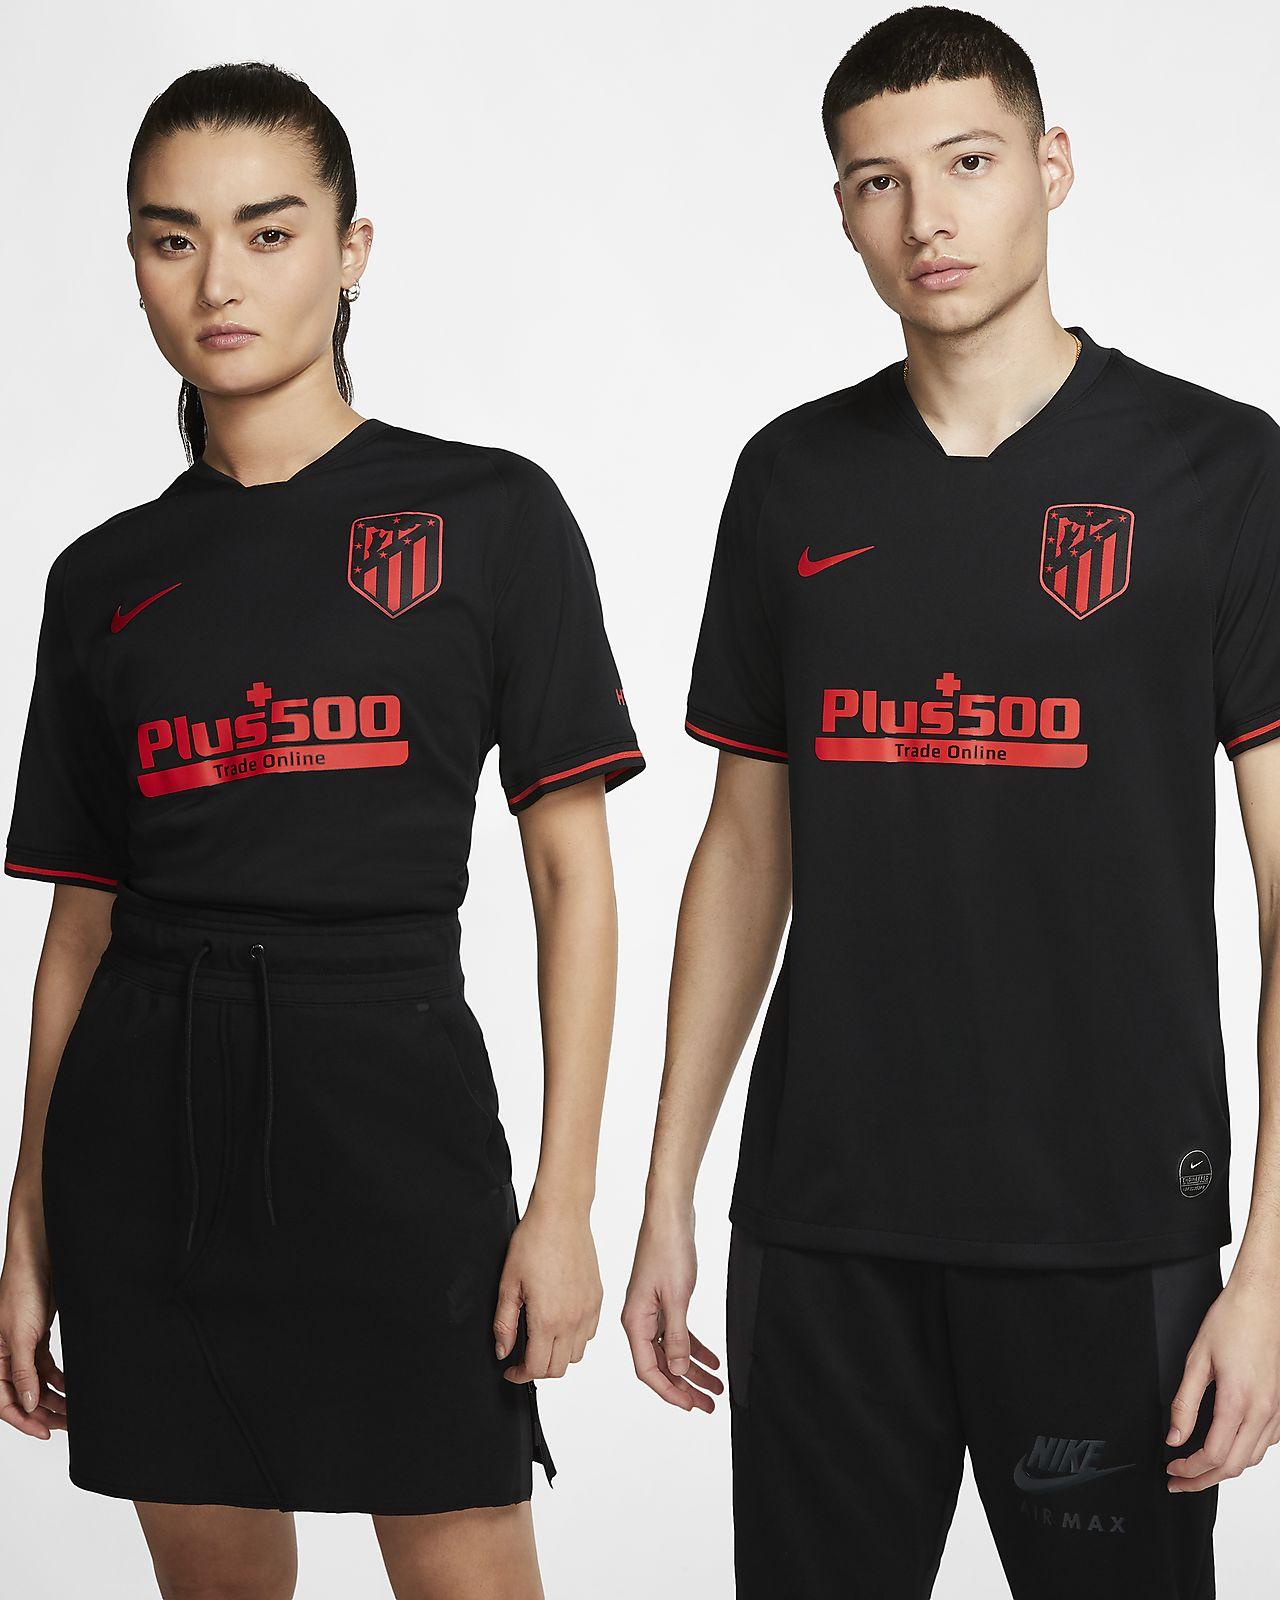 Atlético de Madrid 2019/20 Stadium Away Men's Football Shirt